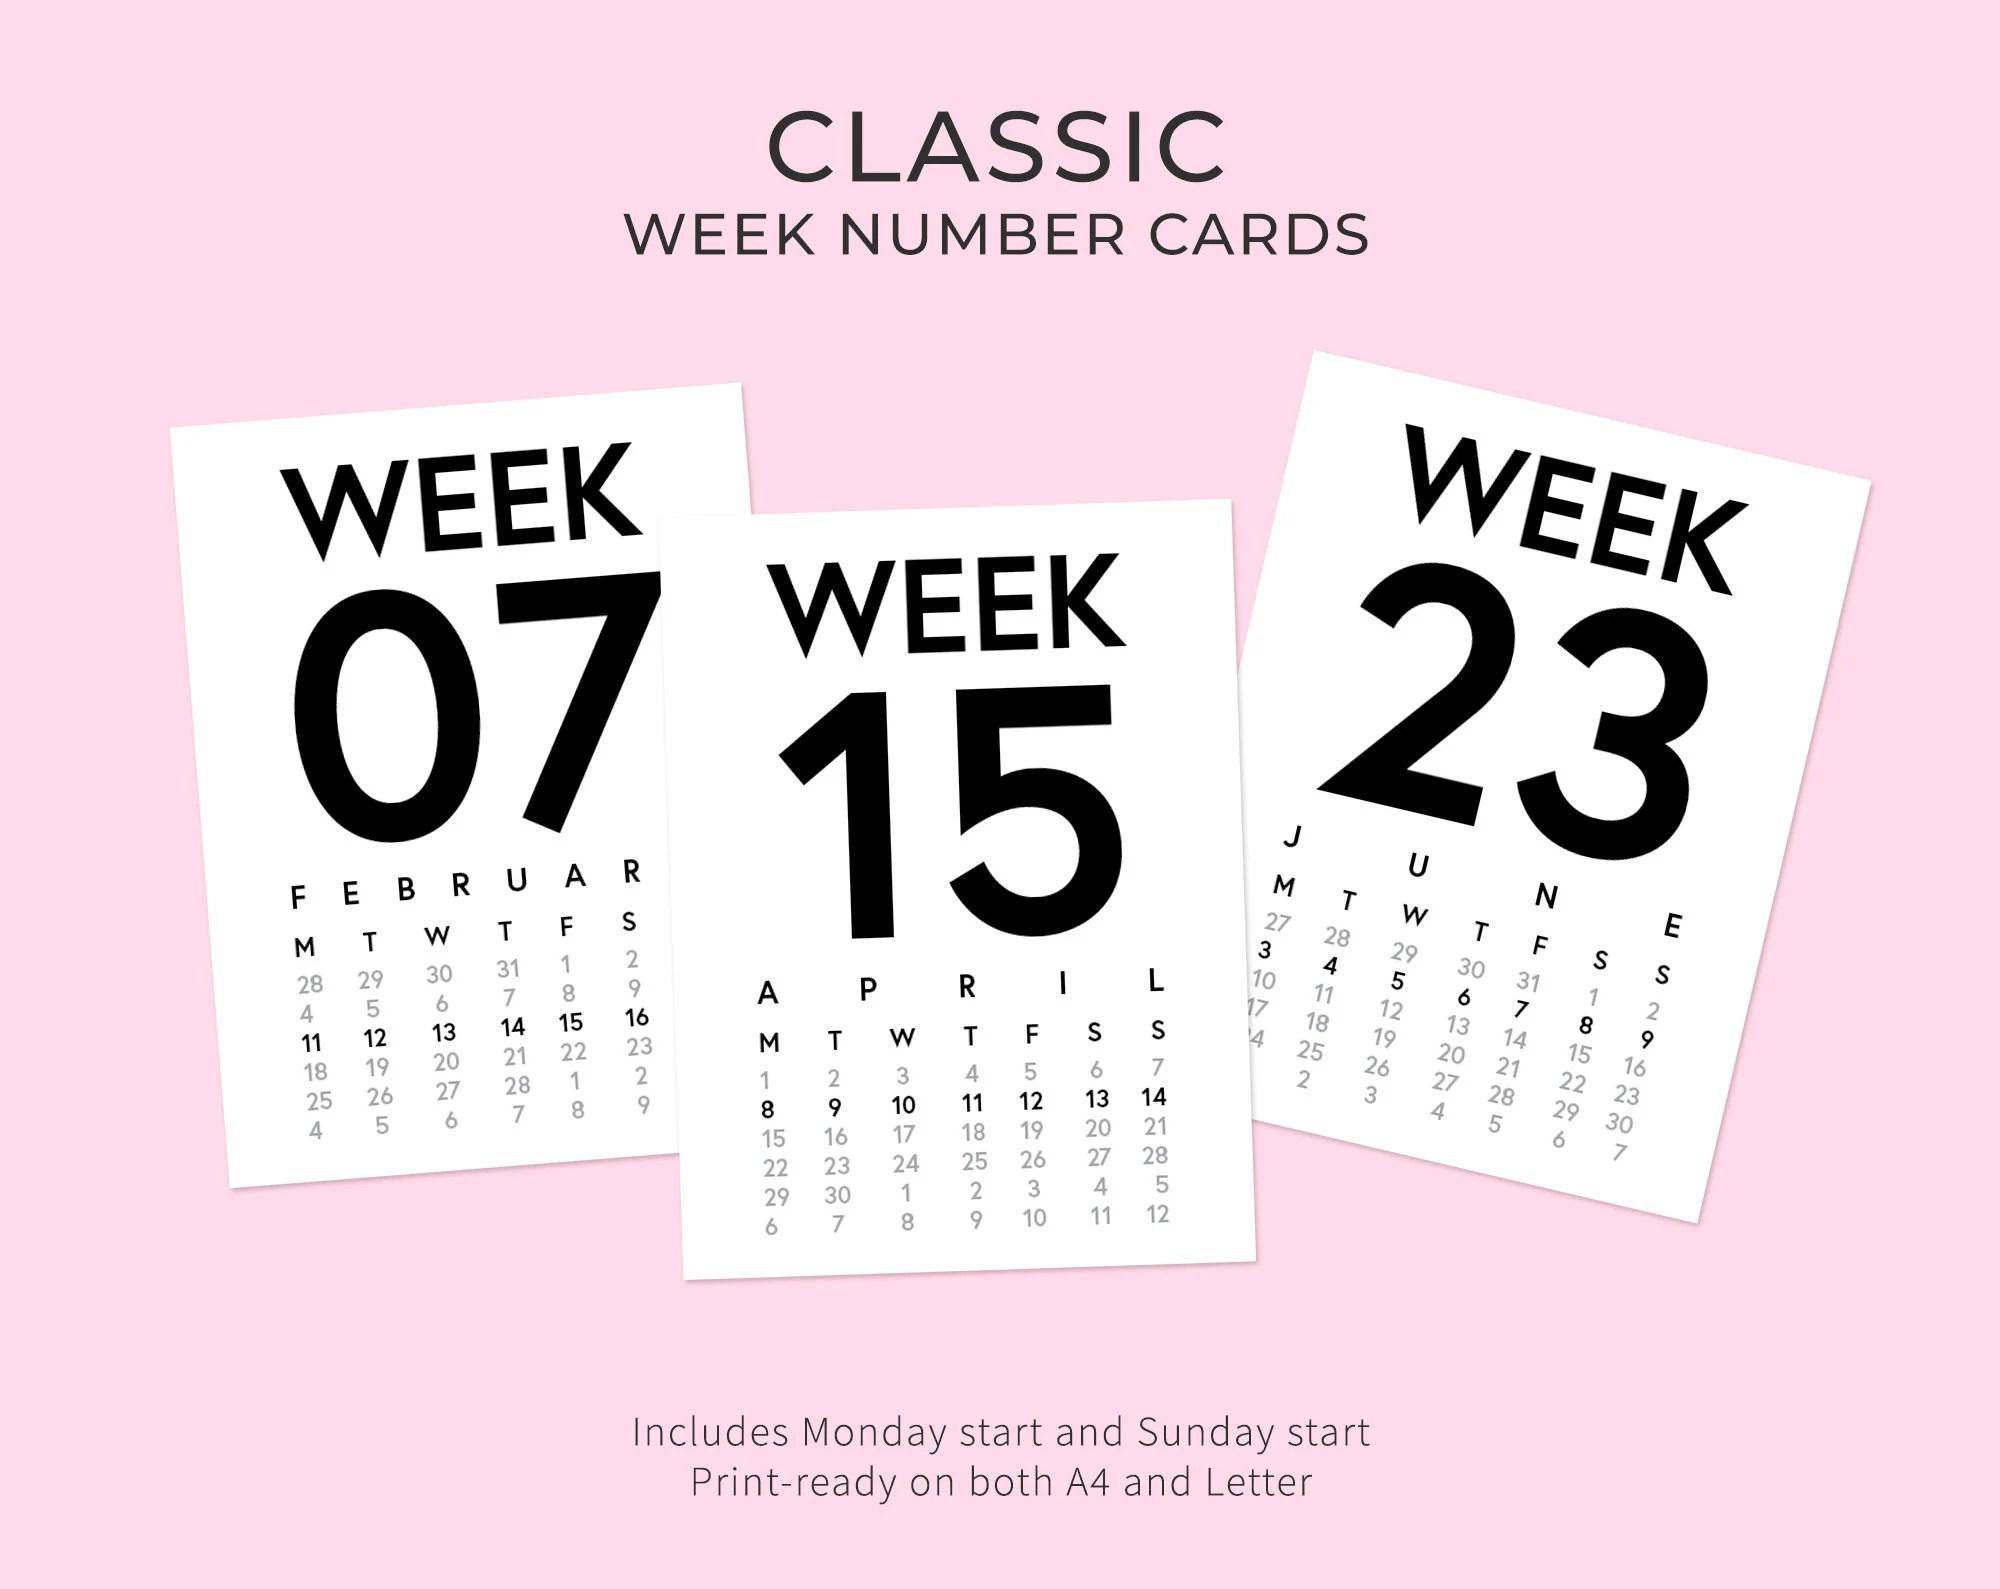 2019 Classic Week Number Cards Digital Journaling Card Etsy